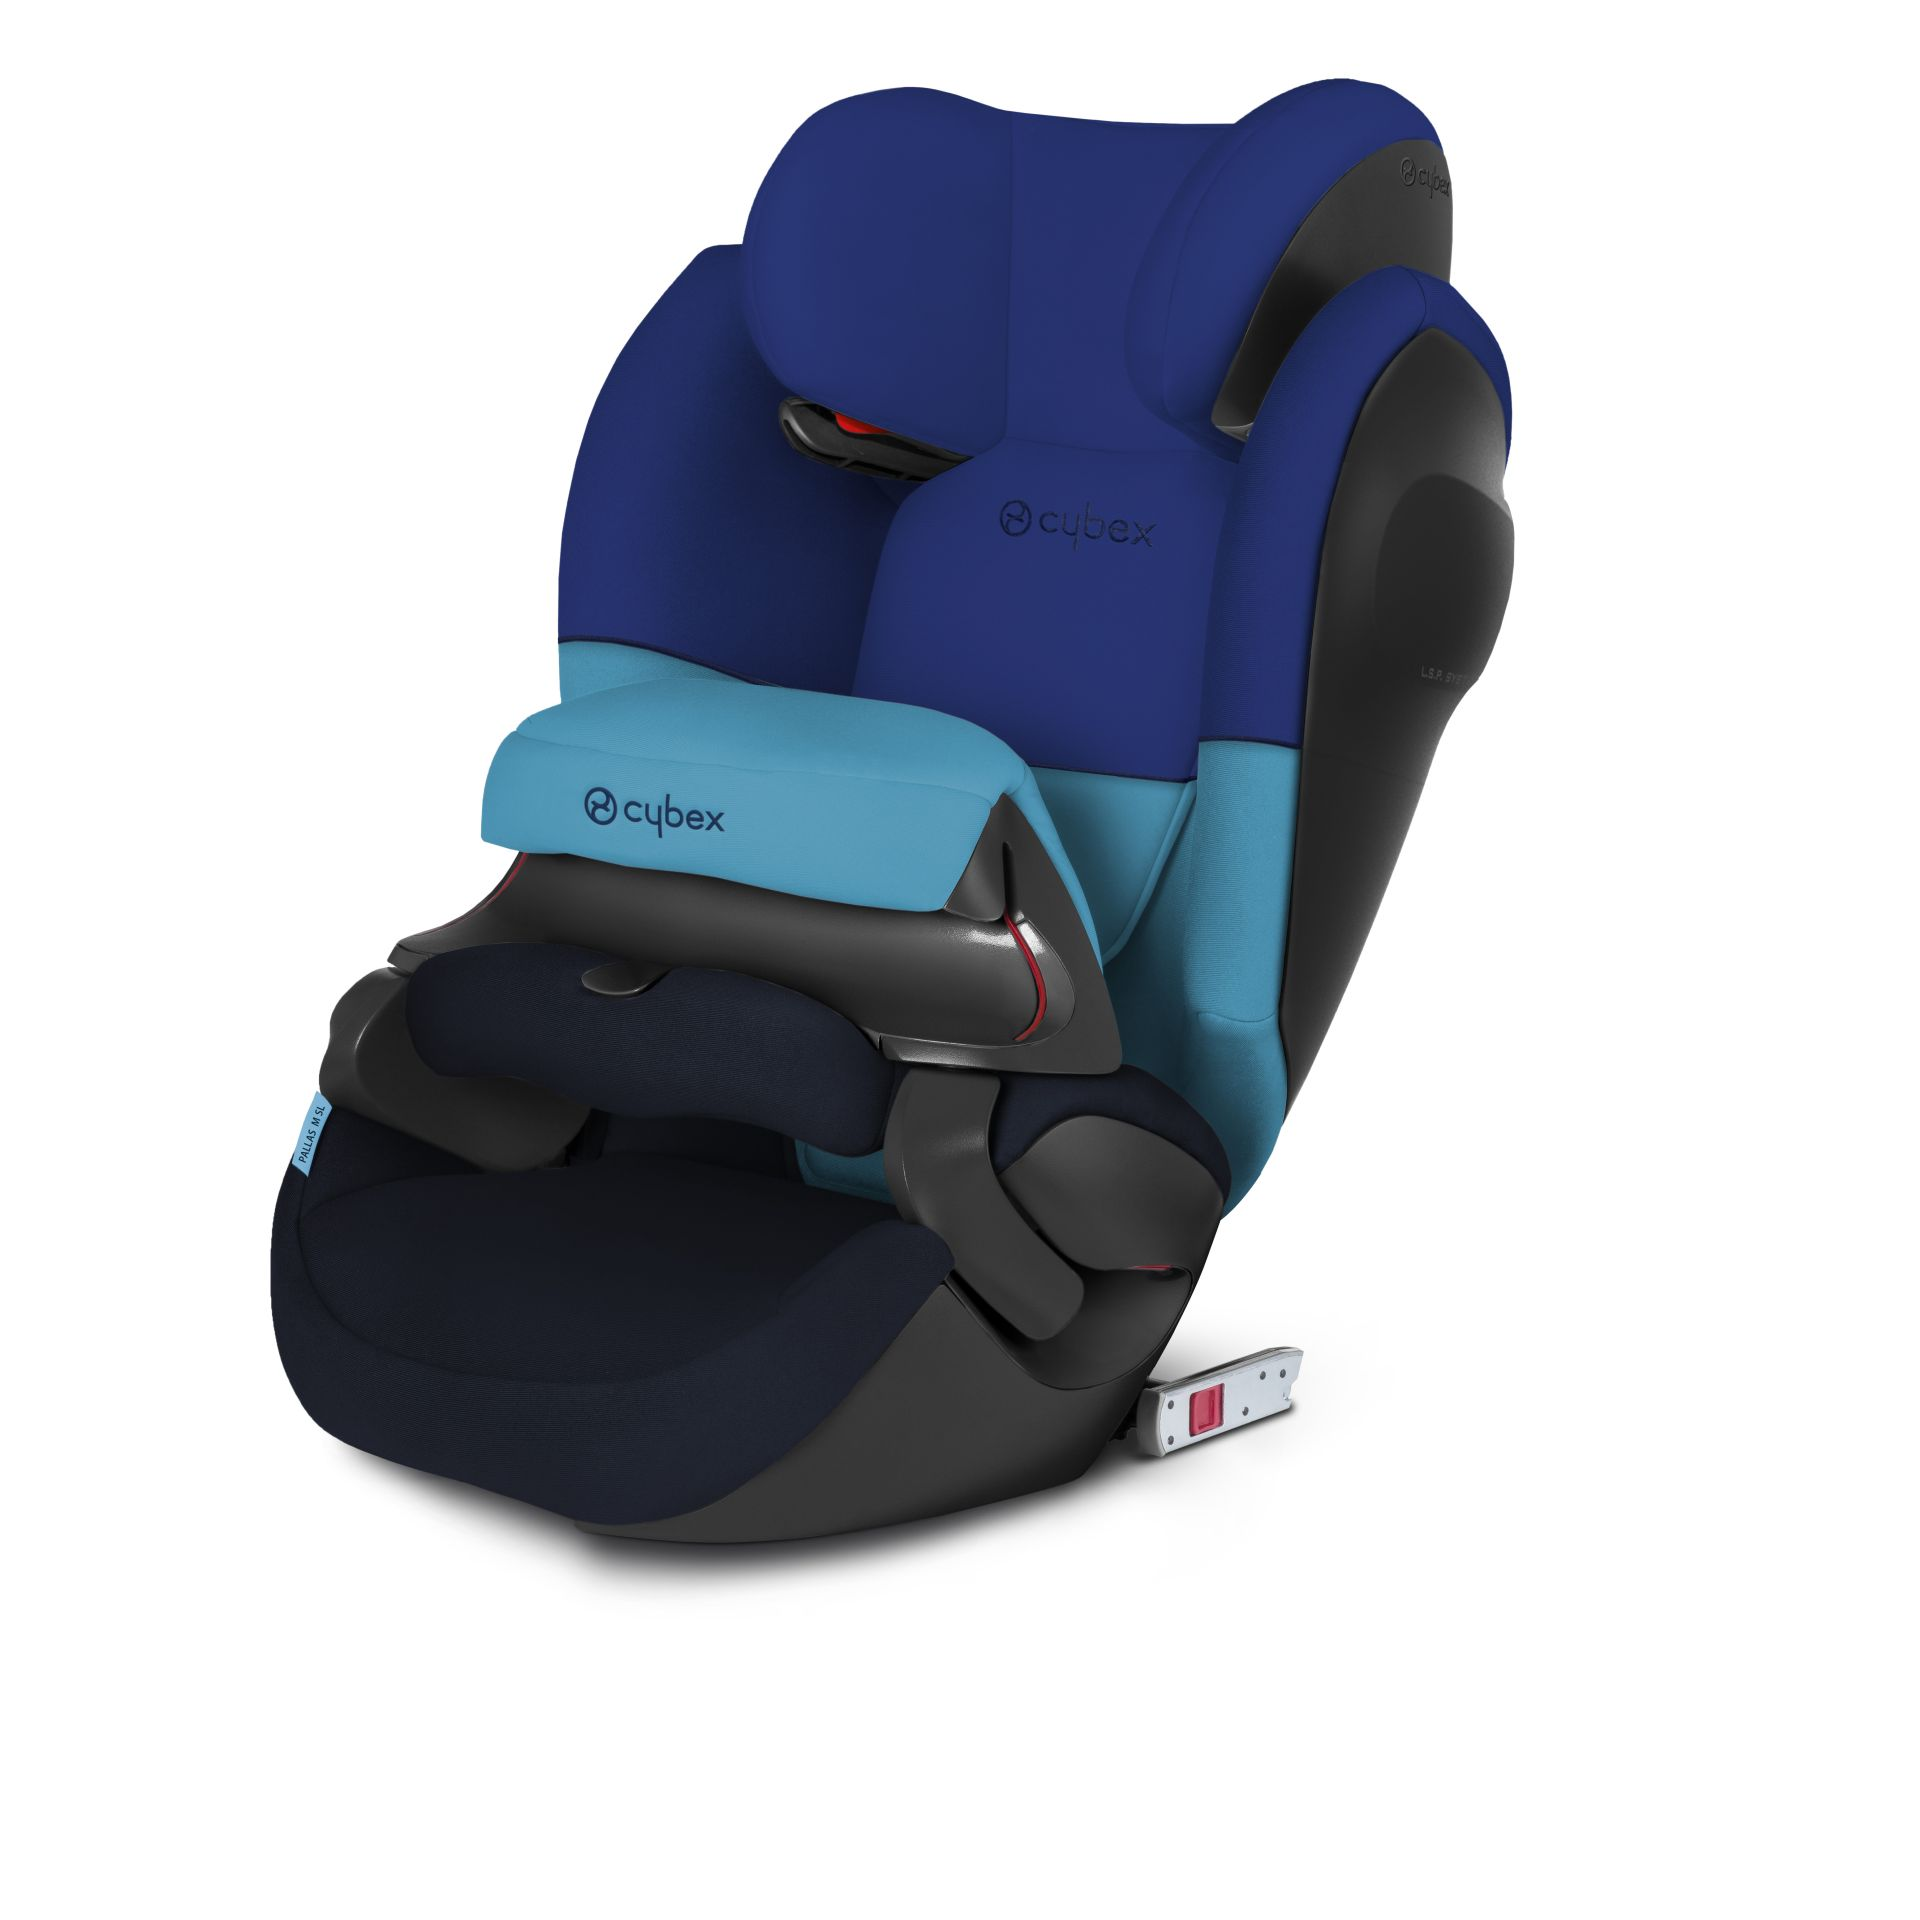 cybex child car seat pallas m fix sl 2019 blue moon navy. Black Bedroom Furniture Sets. Home Design Ideas